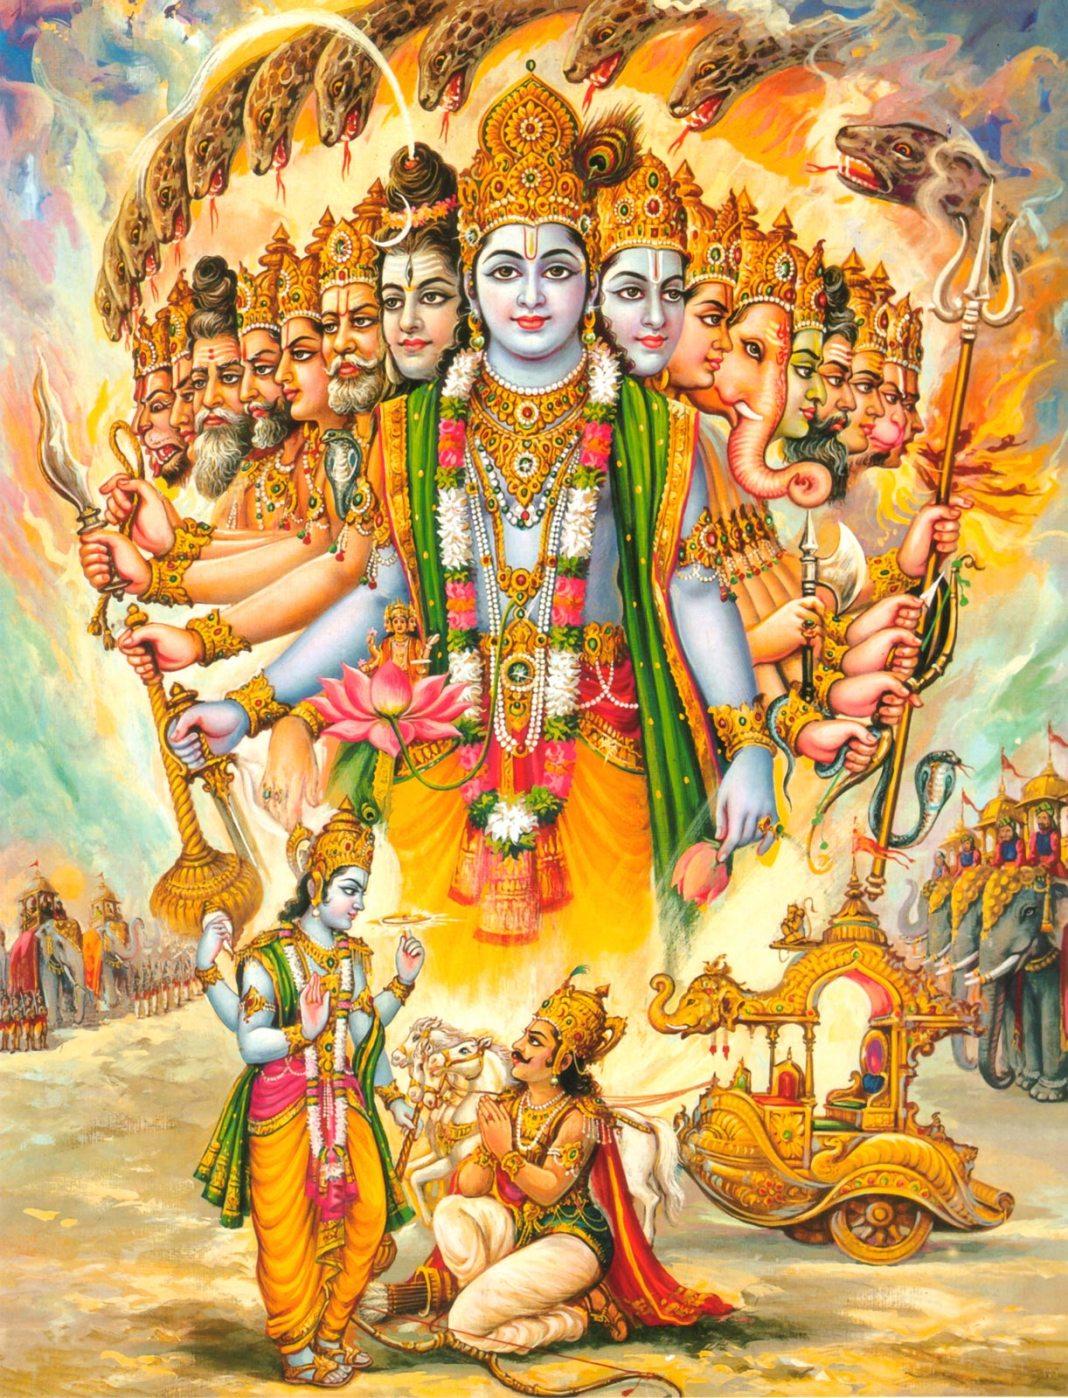 Lord Krishna Virat Roop